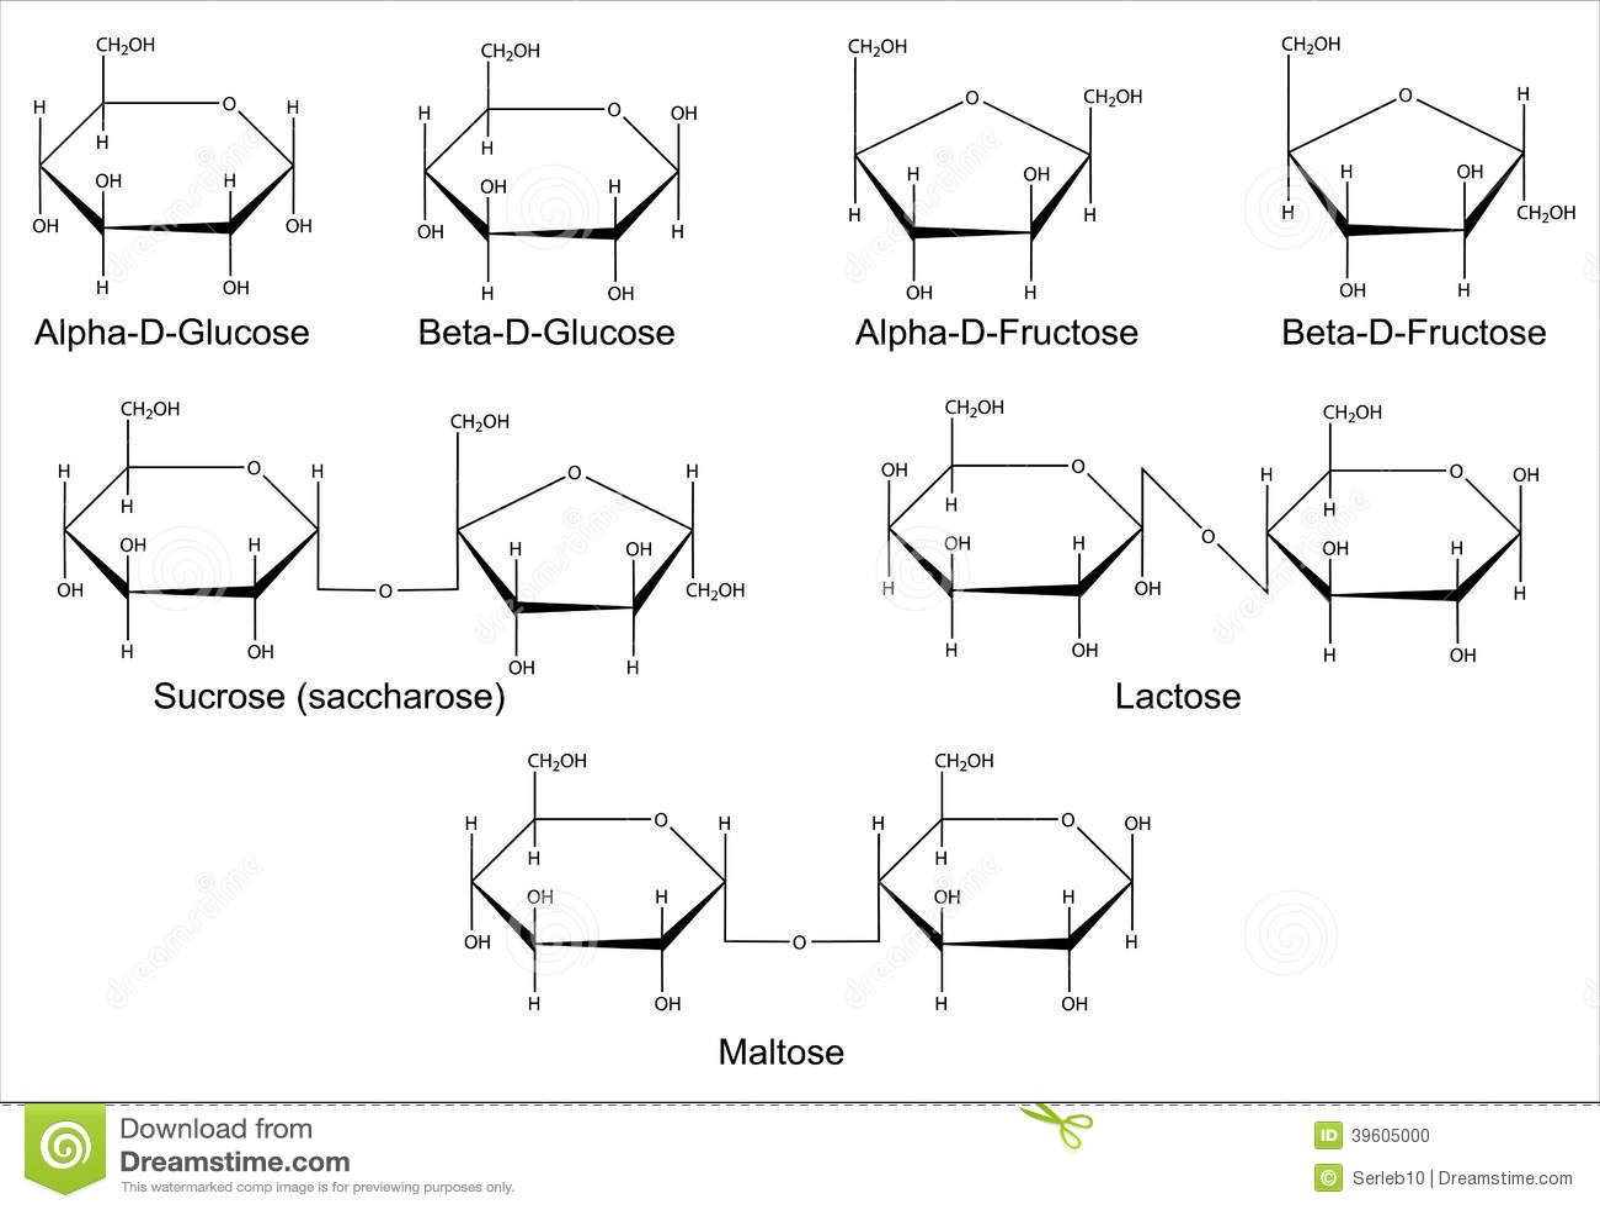 monosaccharides and disaccharides Sugars monosaccharides disaccharides polysaccharides  glucose,  galactose, and fructose are single sugars or monosaccharides two  monosaccharides.